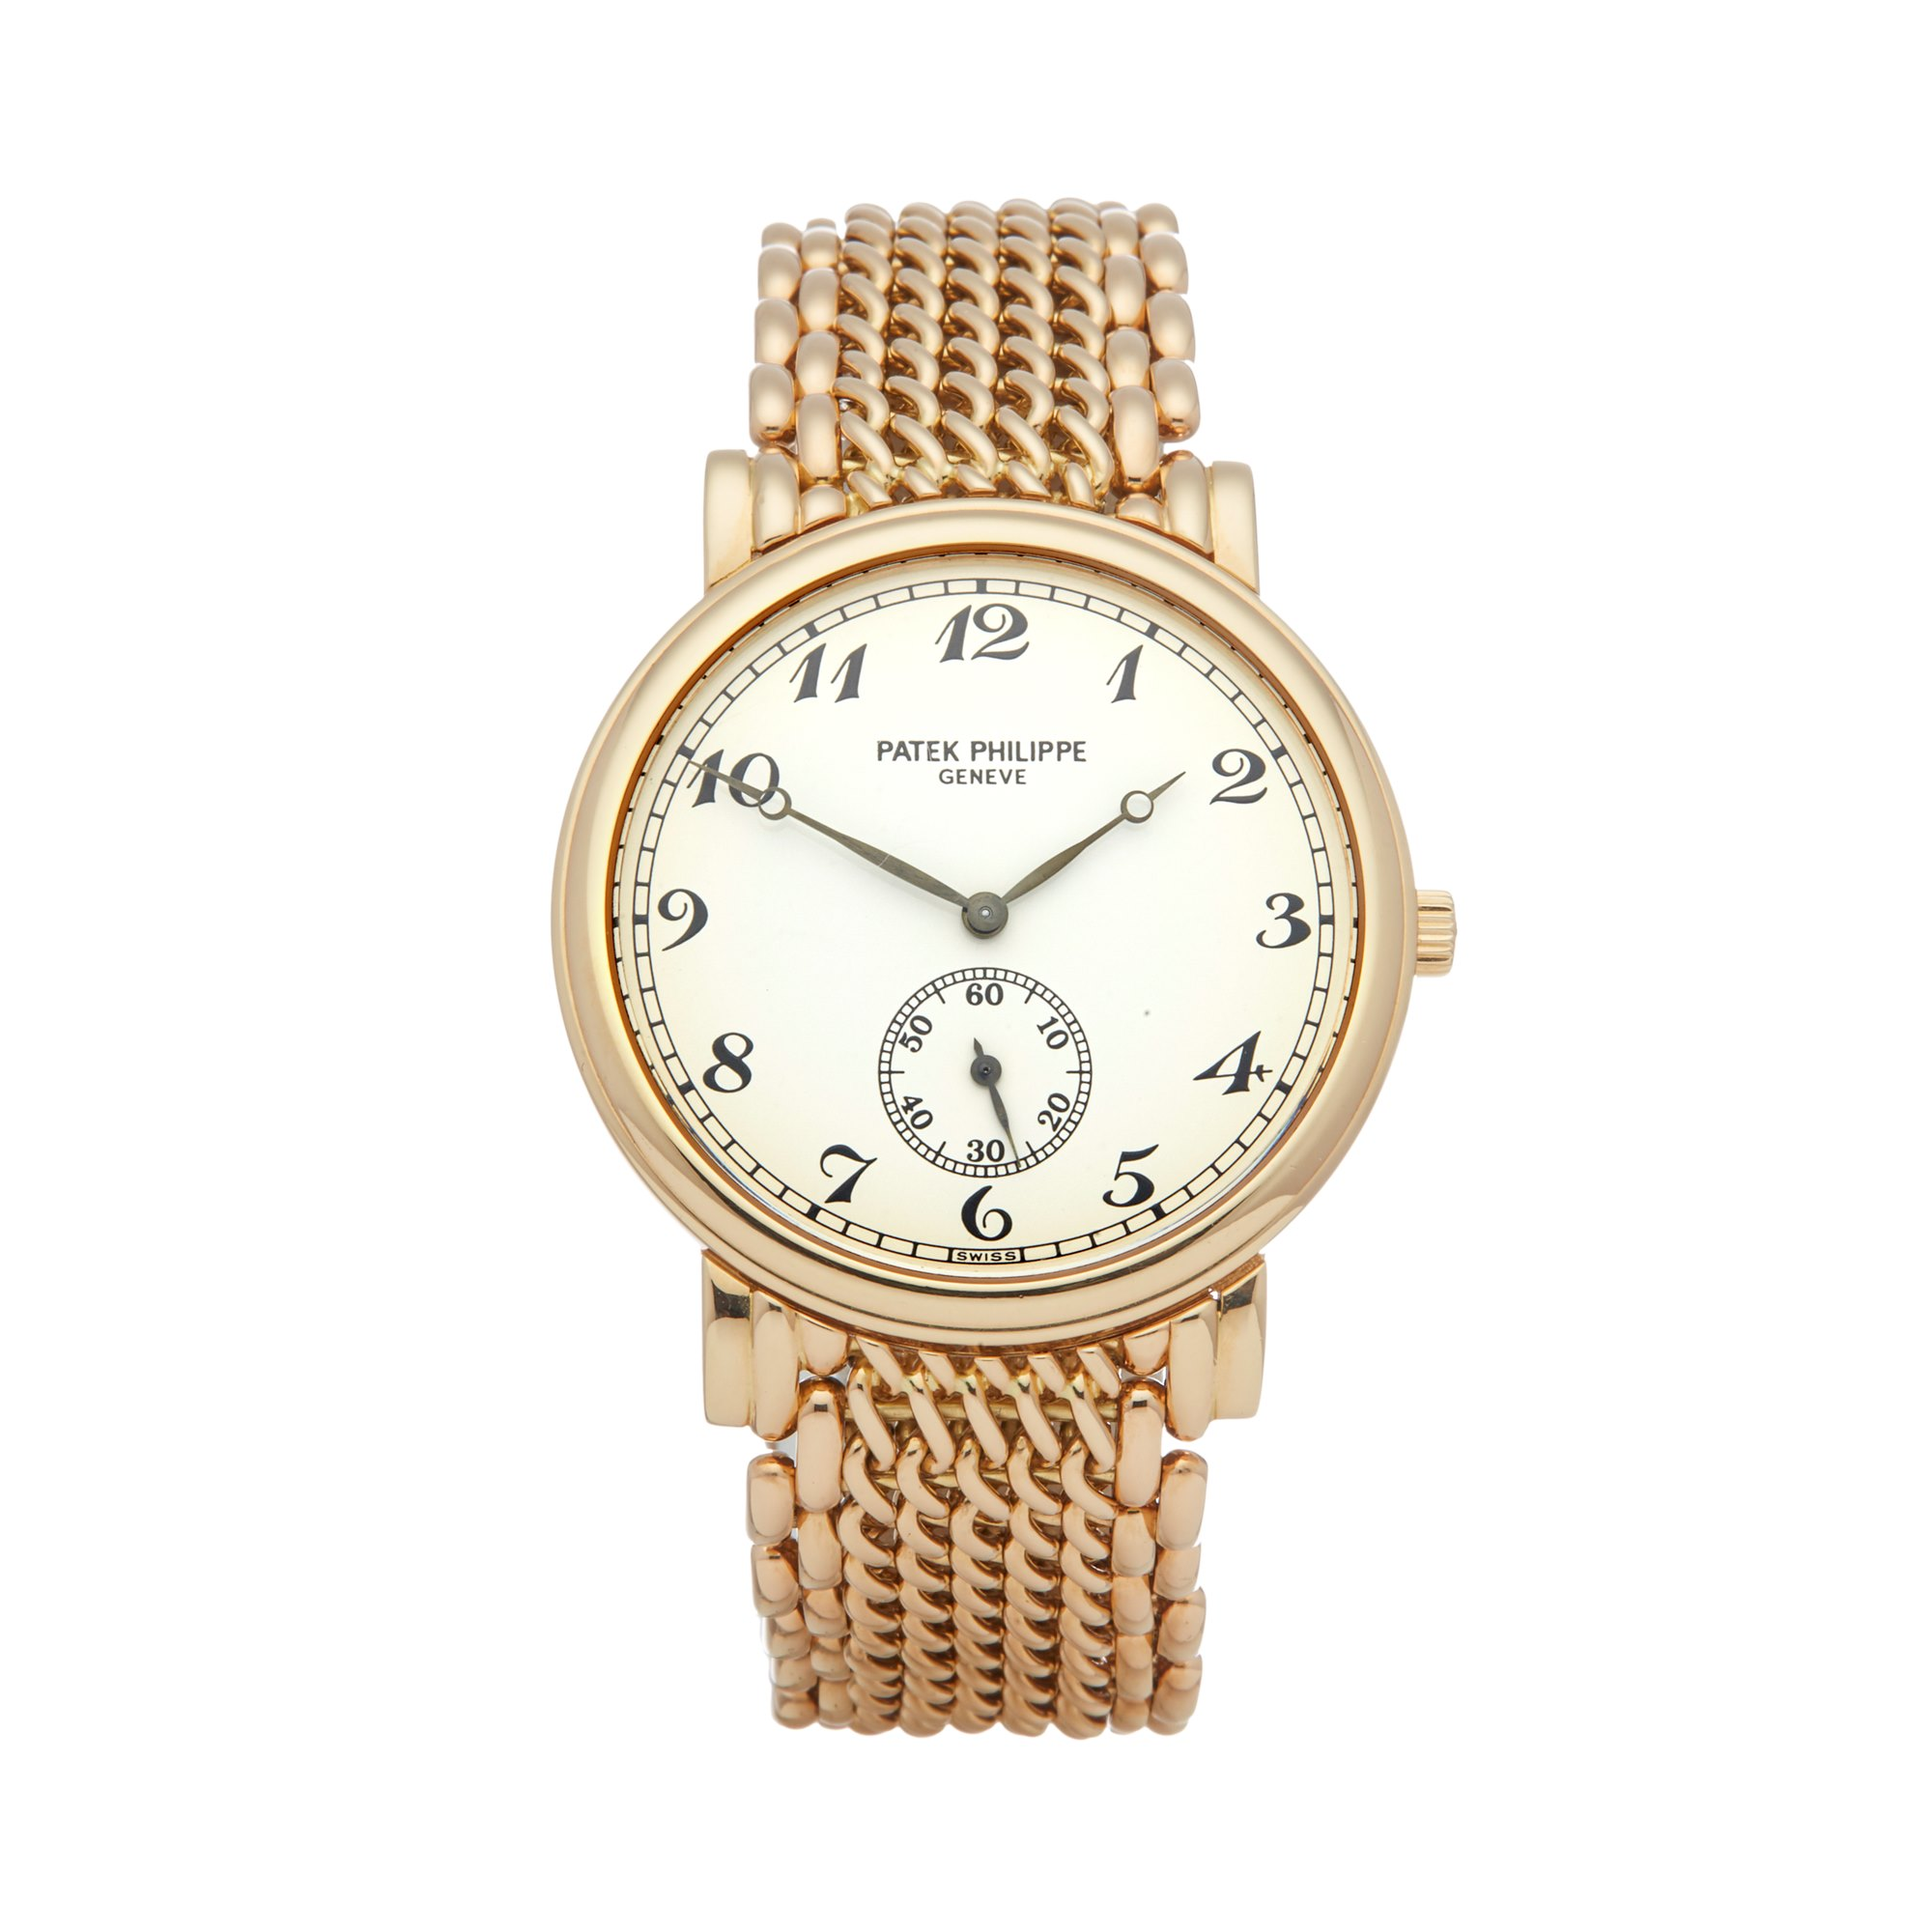 Lot 14 - Patek Philippe Calatrava 5502/1 Men Yellow Gold Watch